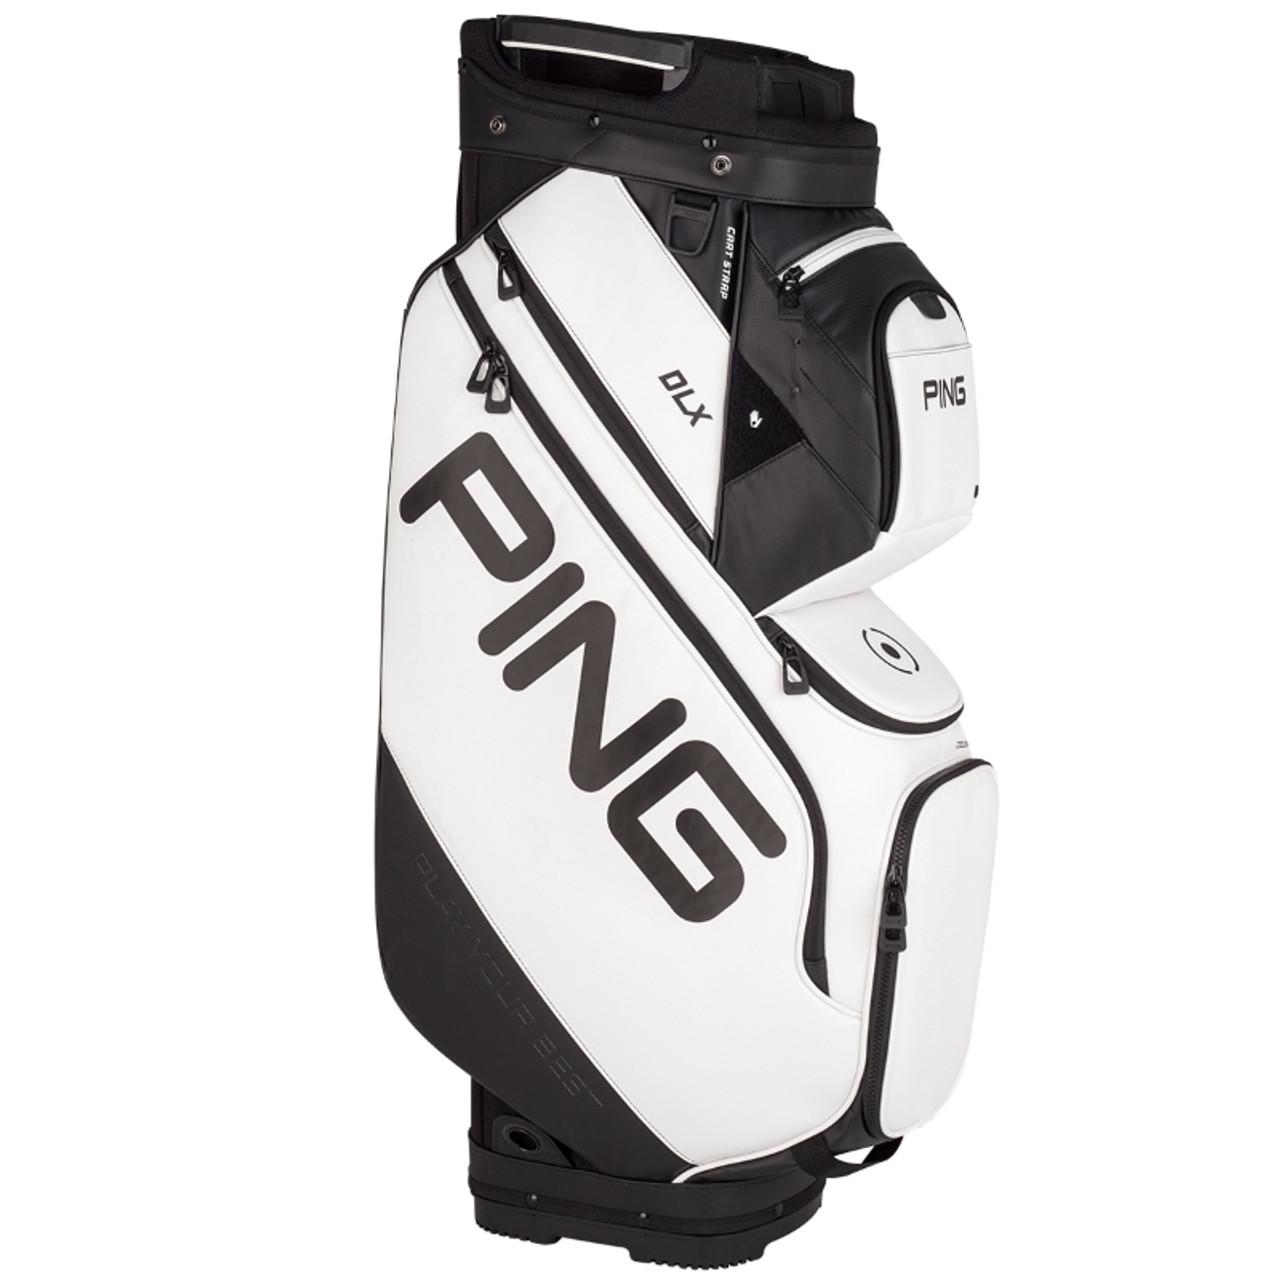 83221fdeeccc Ping DLX Cart Bag